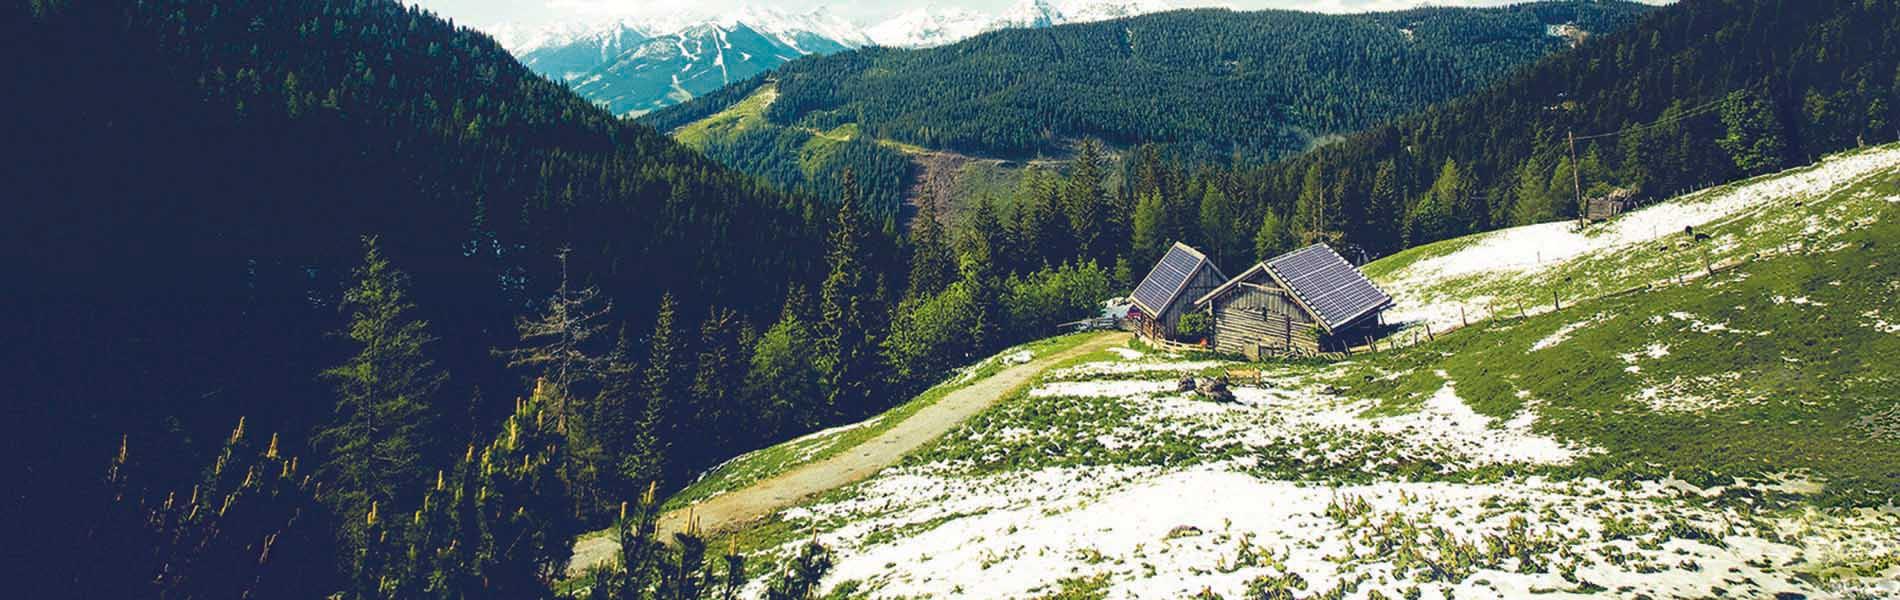 Hütte Berge Alpen Photovoltaik